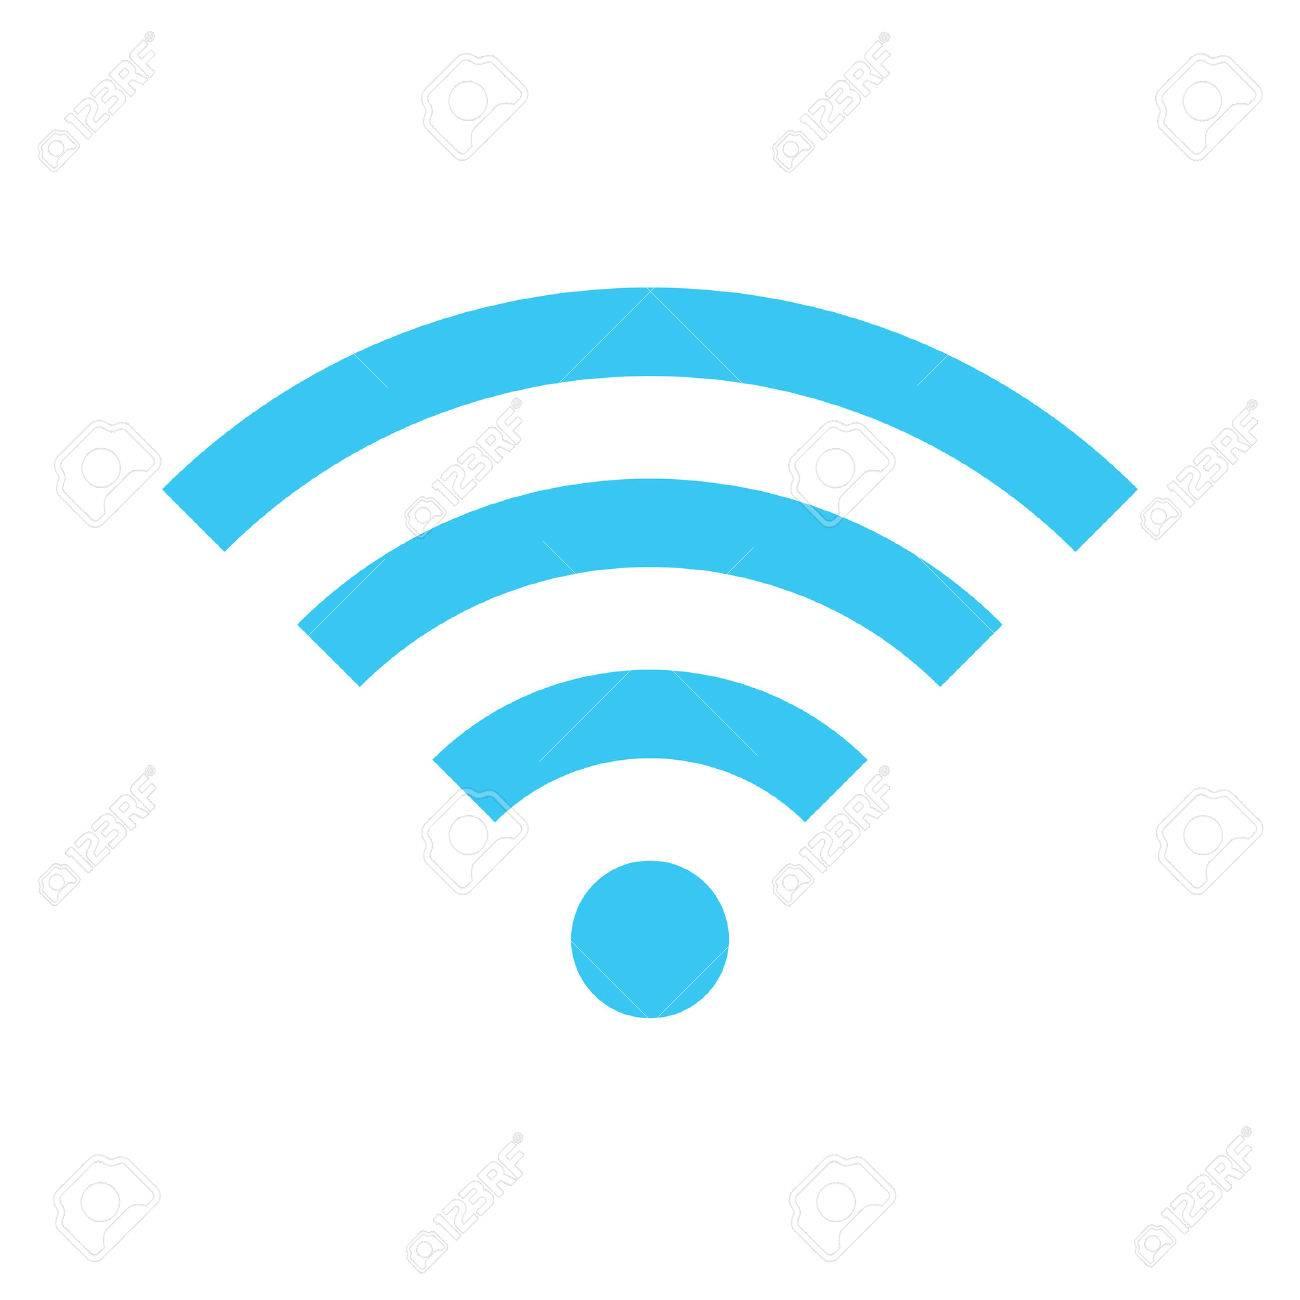 Wireless Network Icon Stock Vector - 22810763